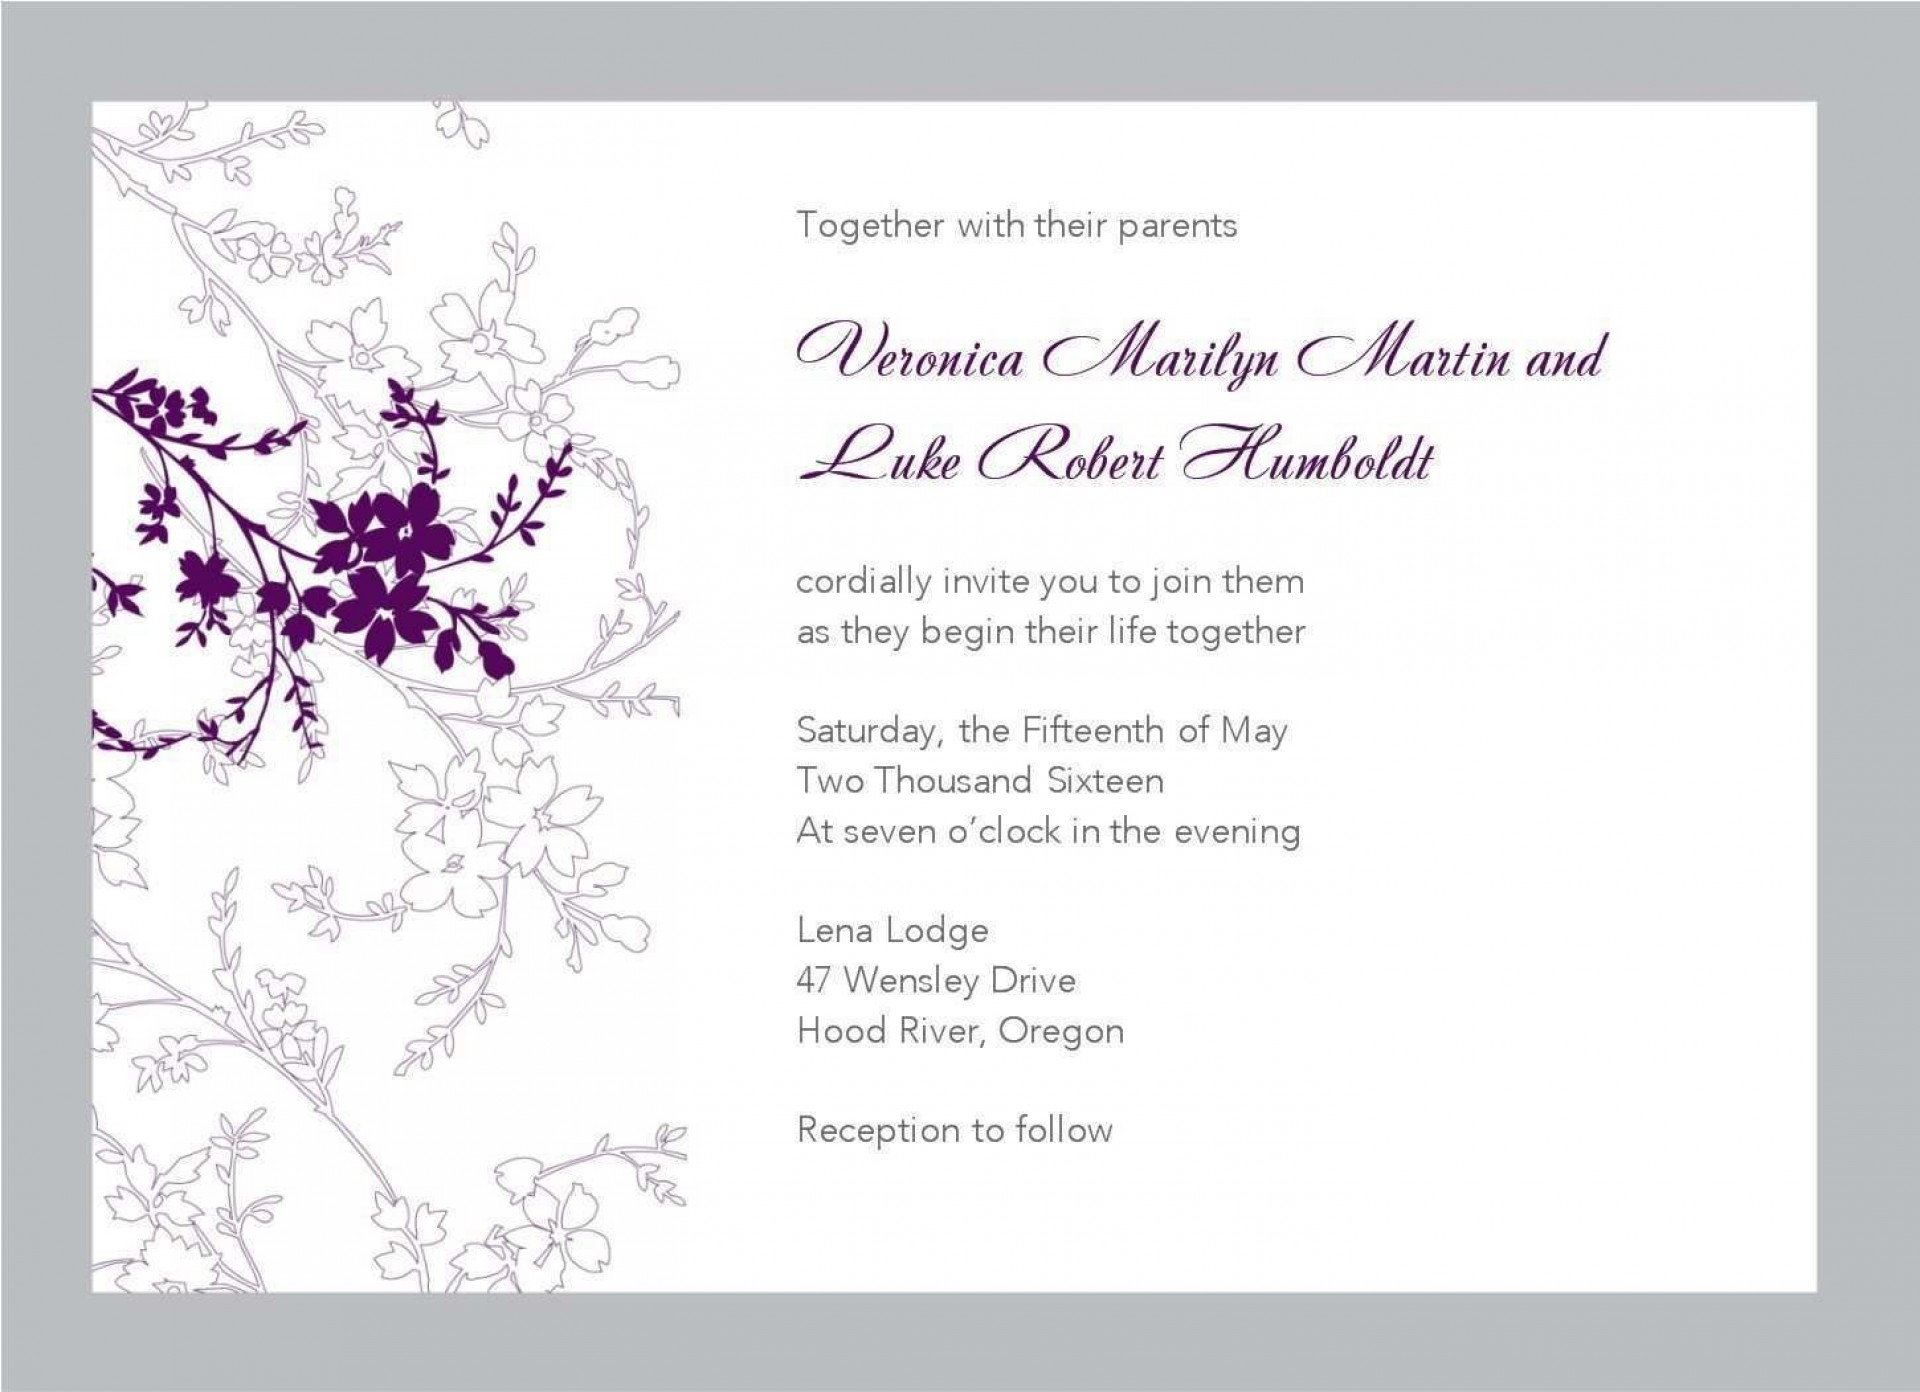 003 Fearsome Wedding Invitation Template Word Inspiration  Invite Wording Uk Anniversary Microsoft Free Marriage1920